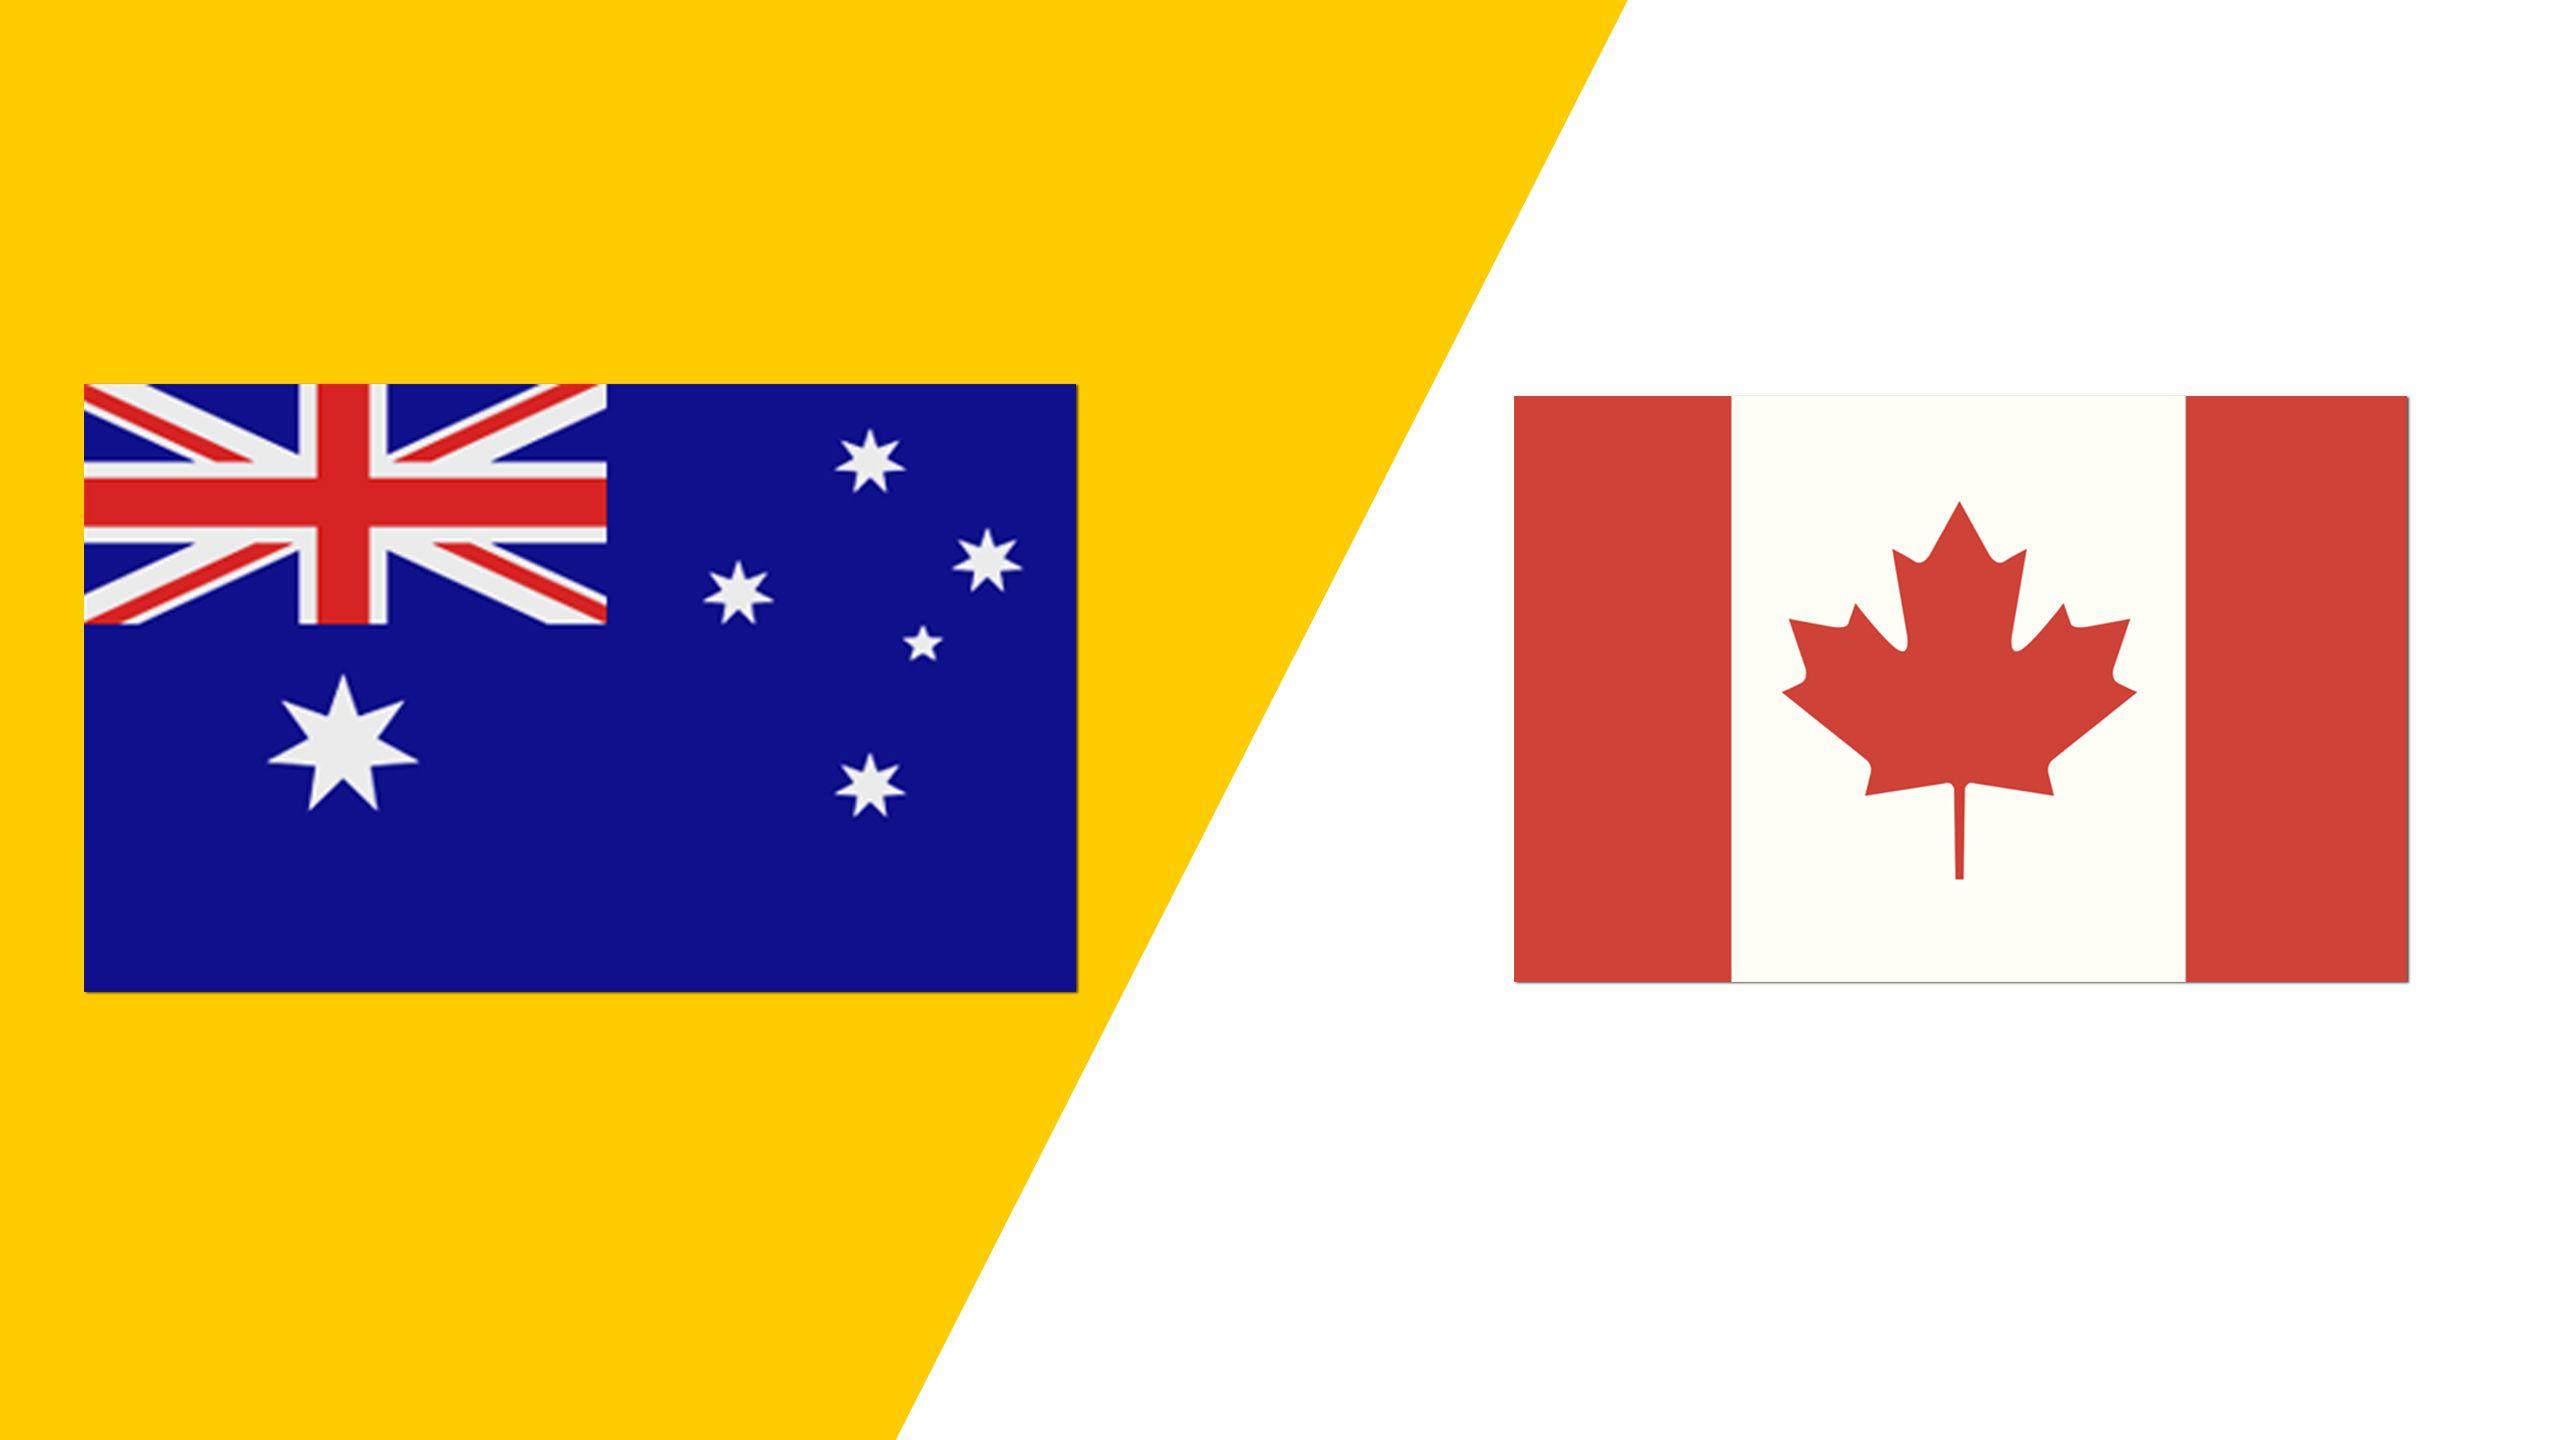 Australia vs. Canada (2018 FIL World Lacrosse Championships)